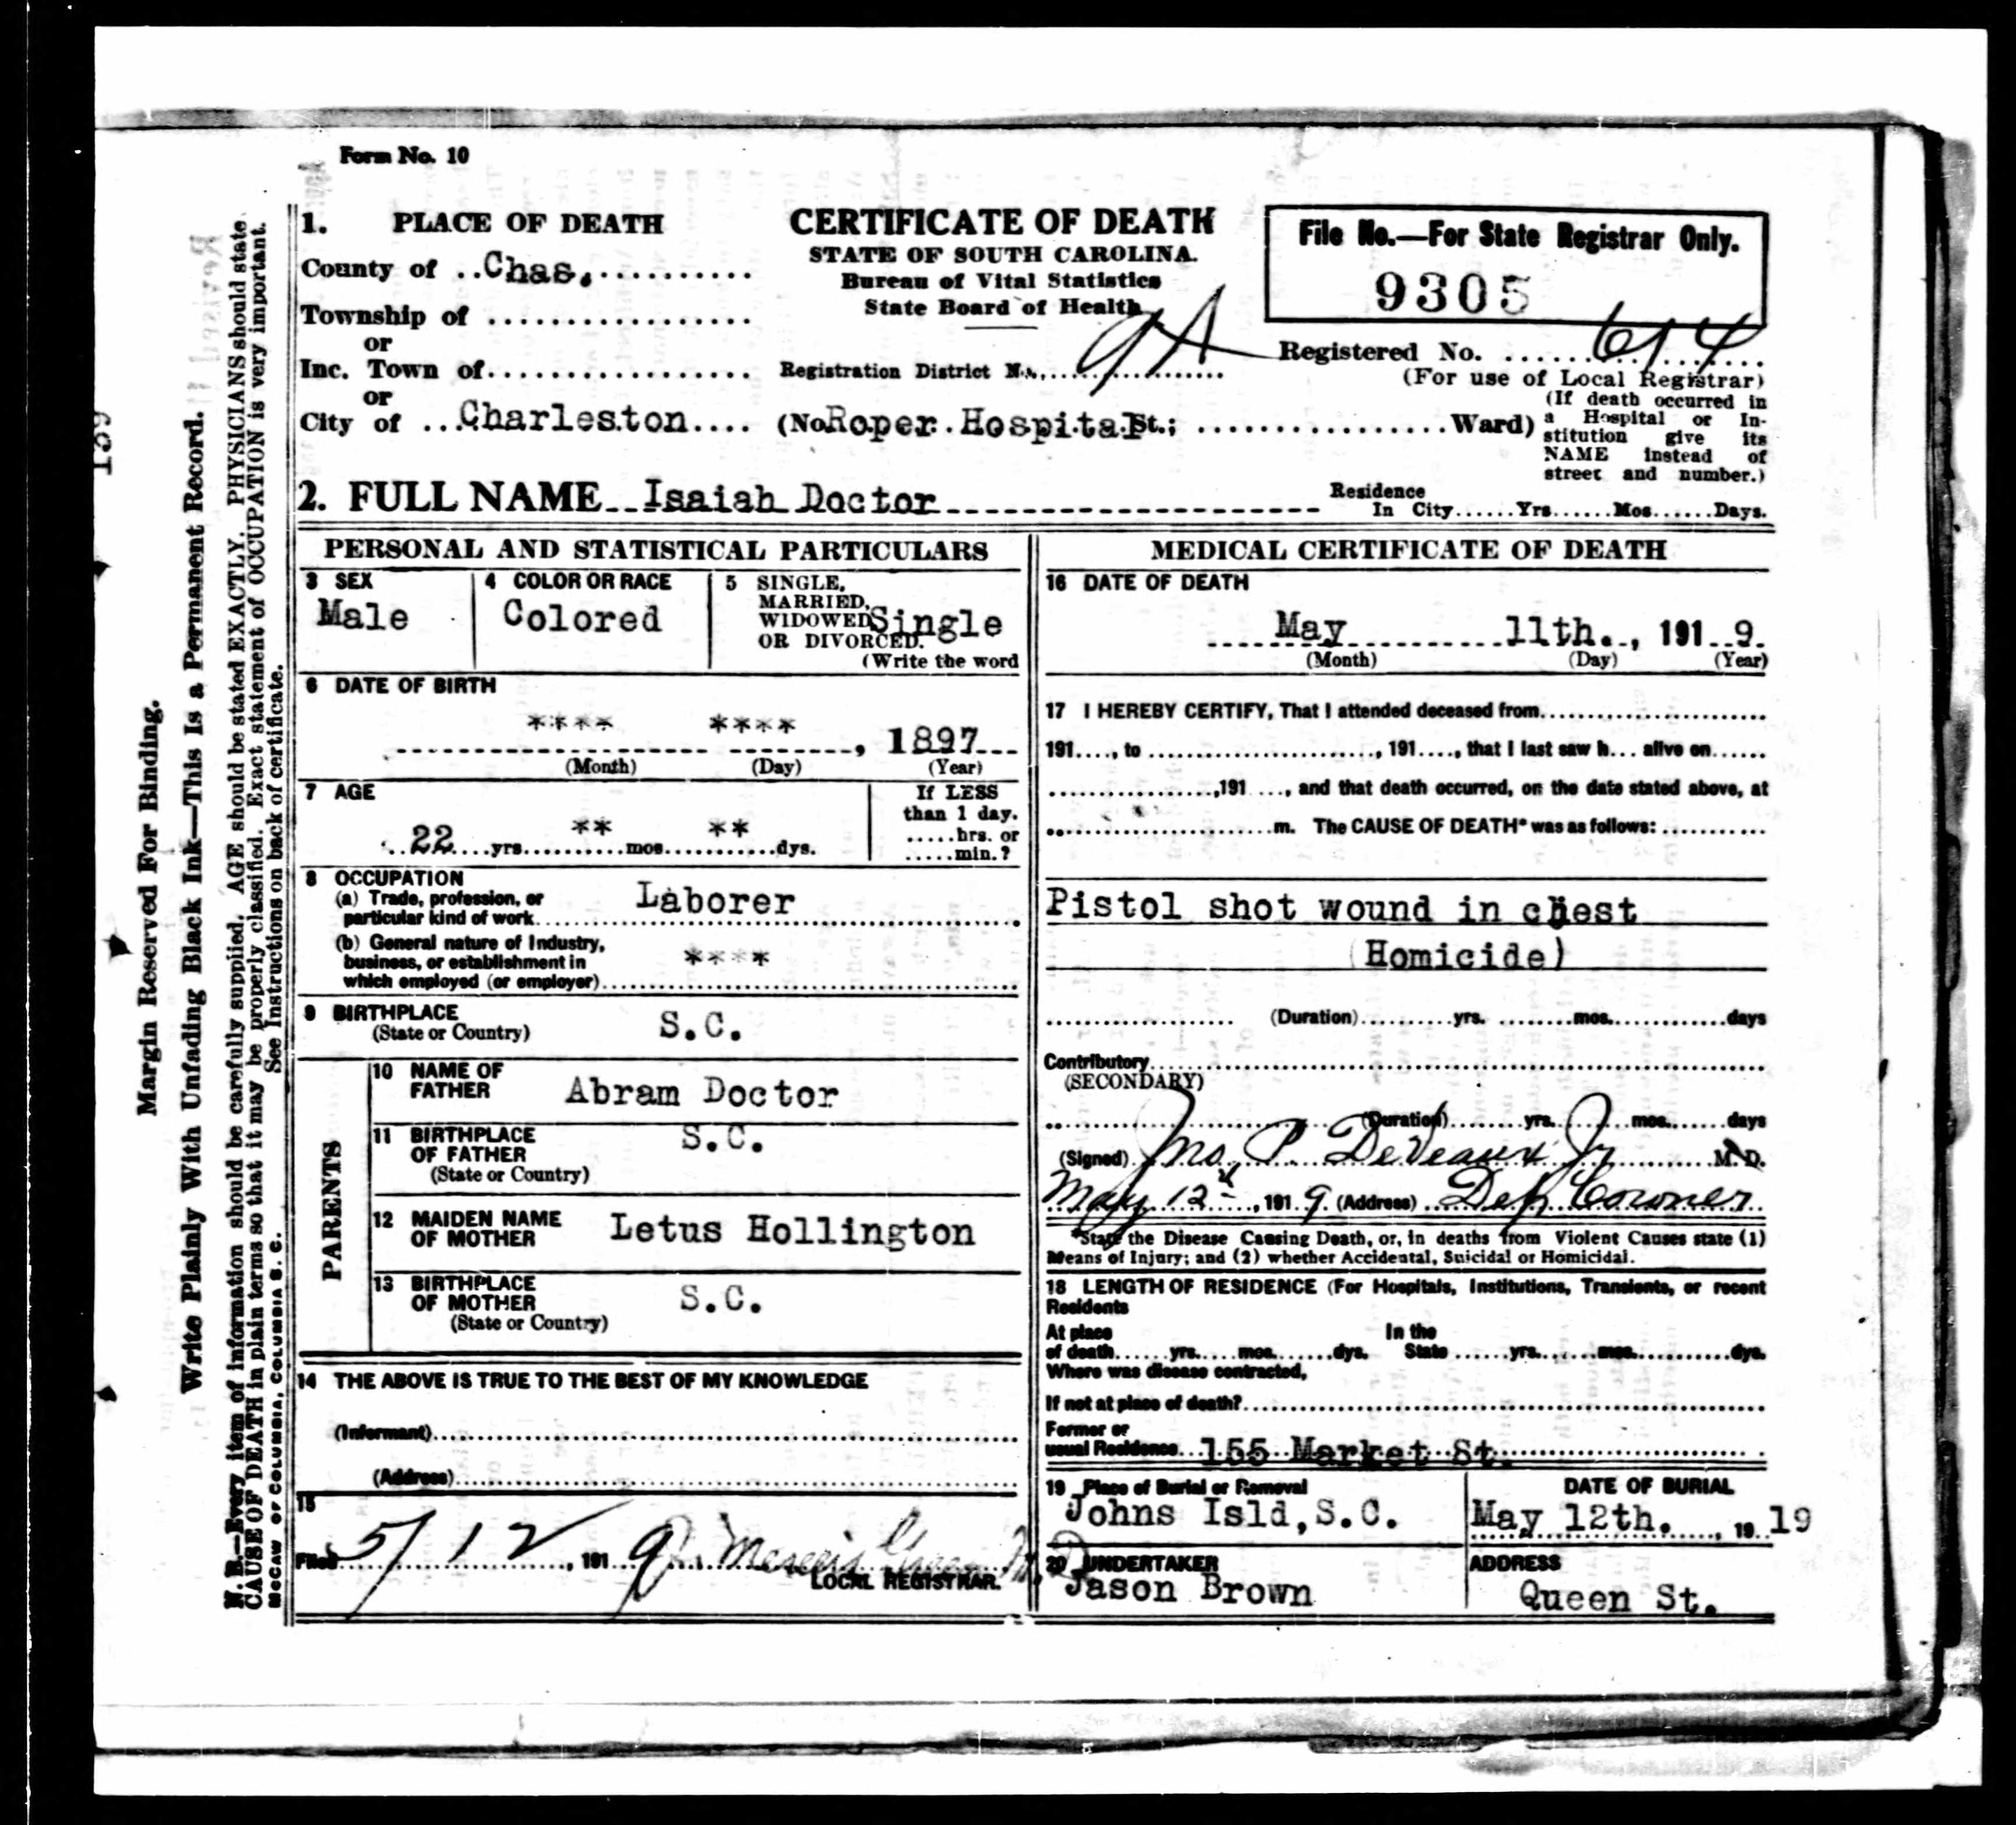 Doctor's death certificate.